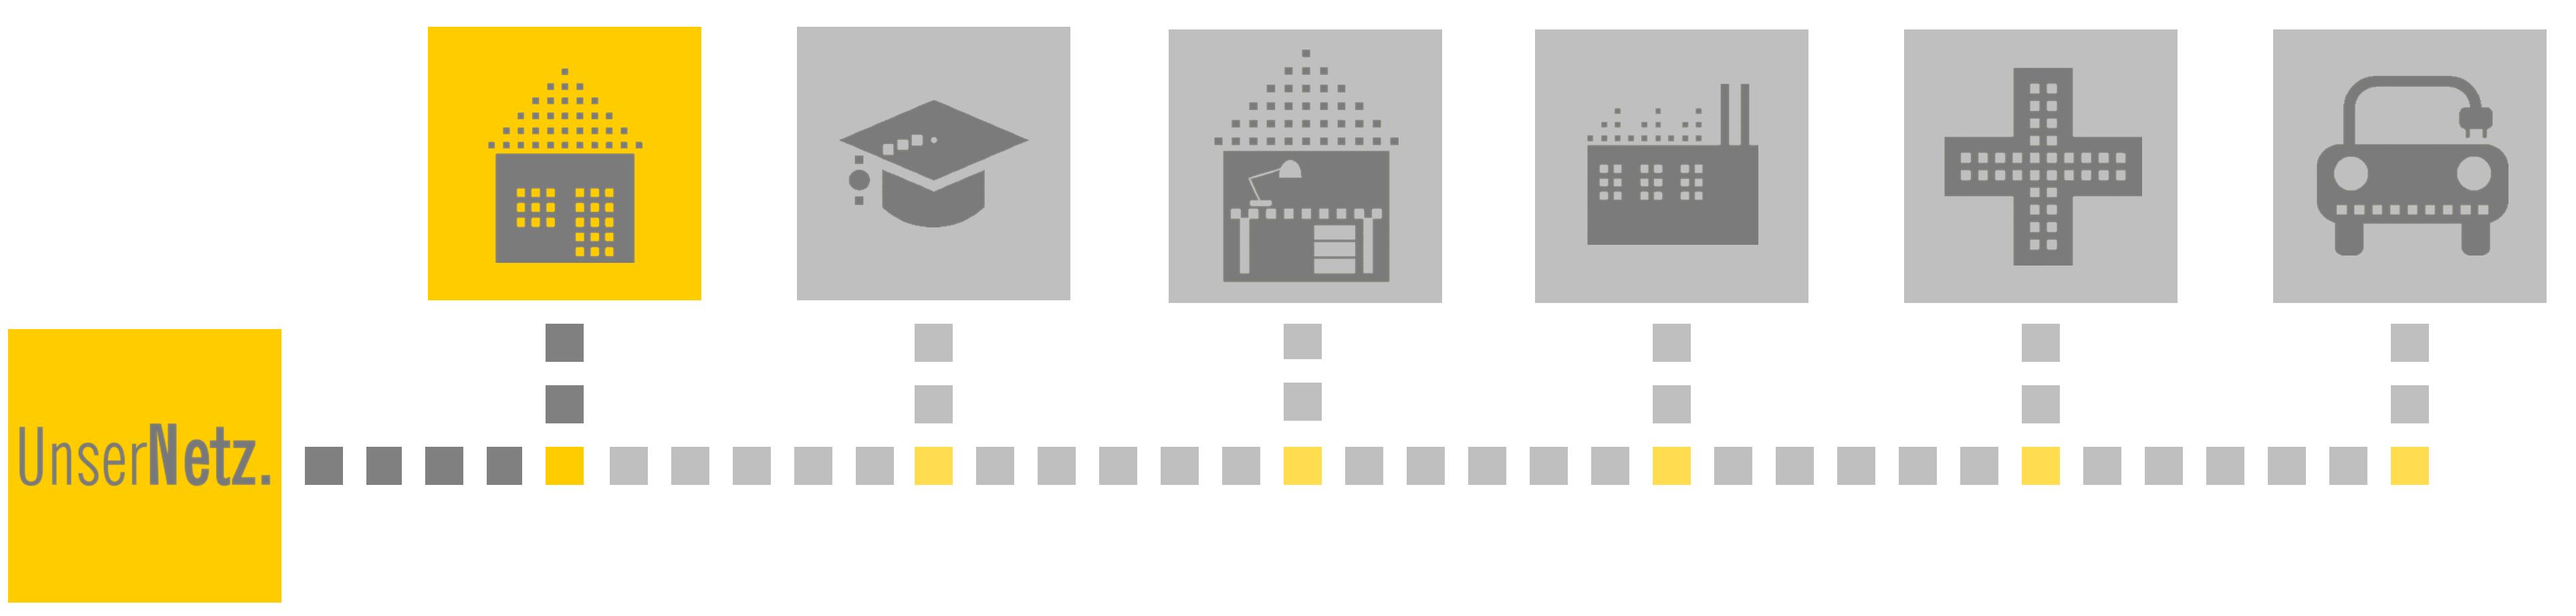 Icons-UnserNetz_Haushalte